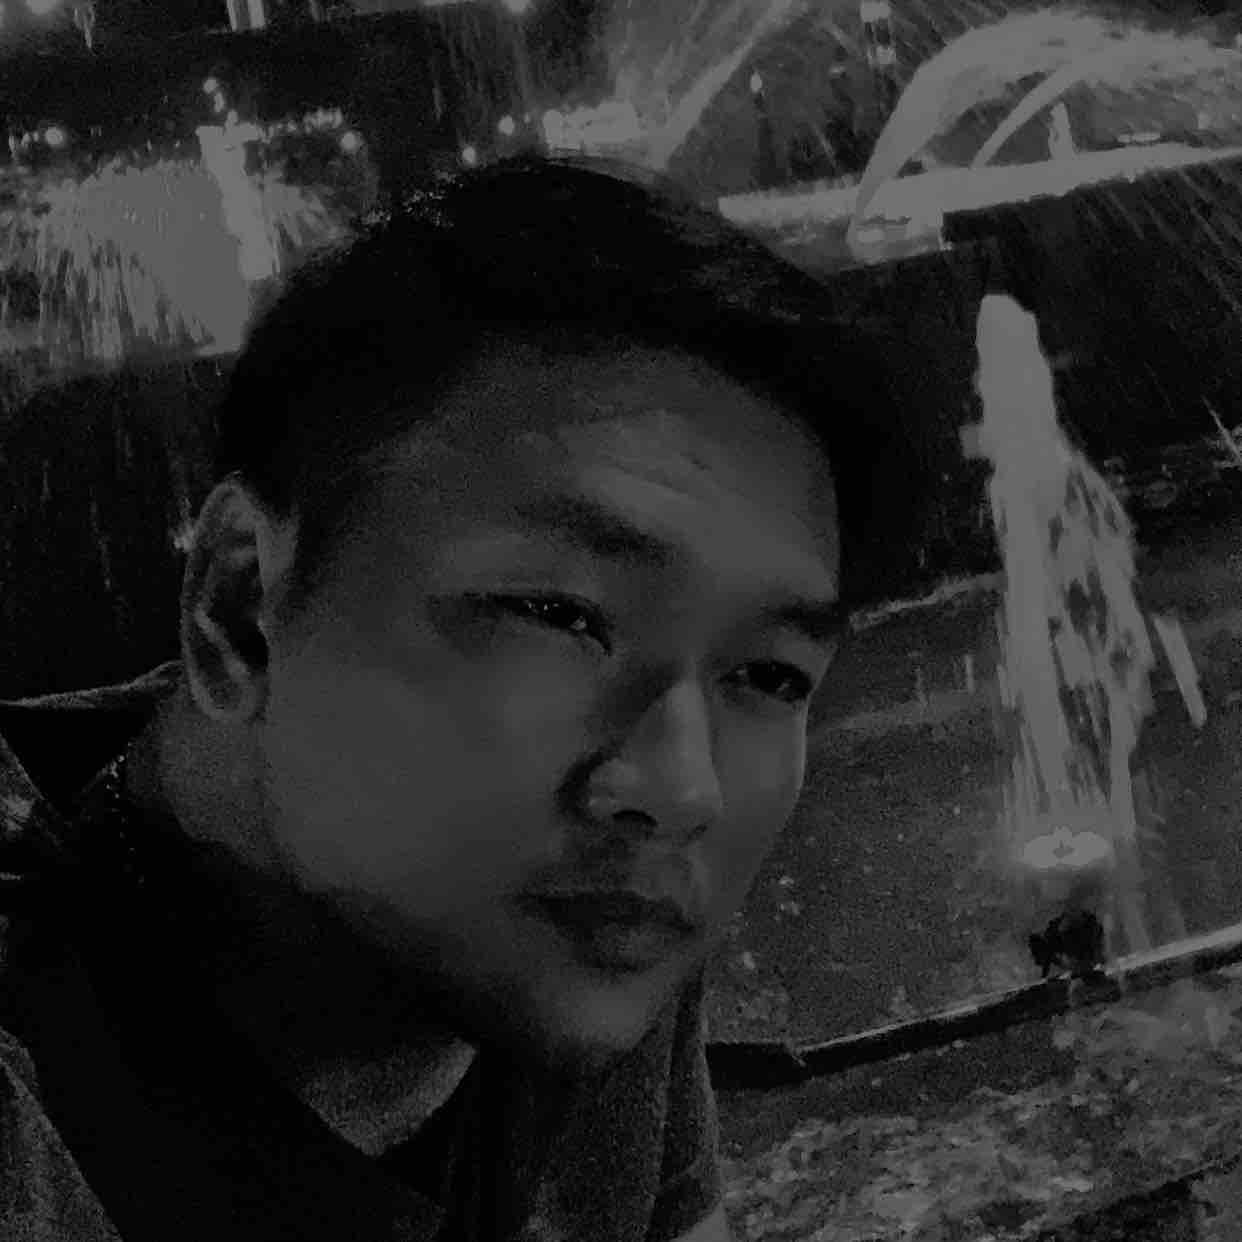 ThanhDat Nguyen